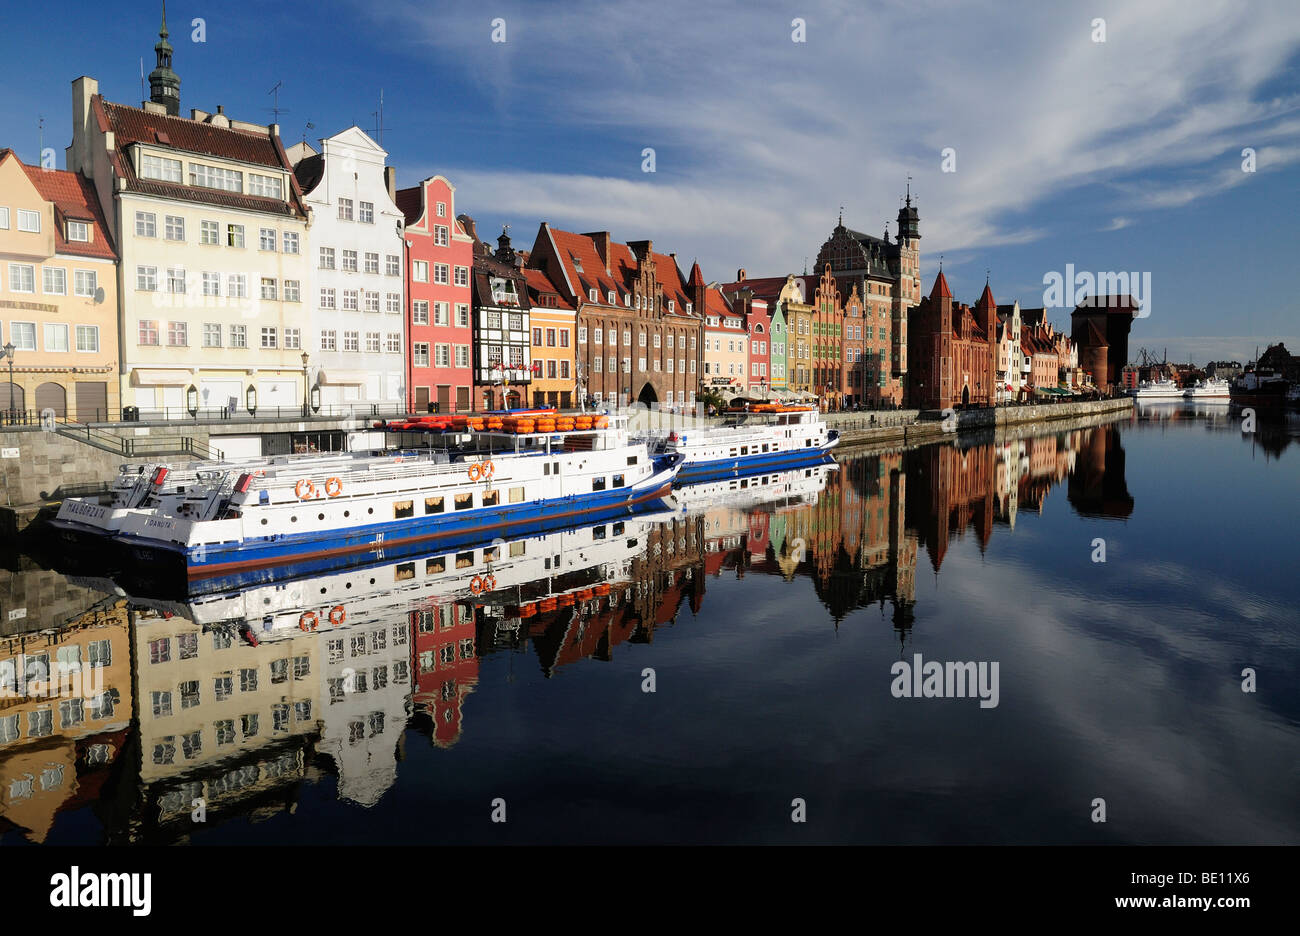 Gdansk waterfront, Motlava river, Poland - Stock Image